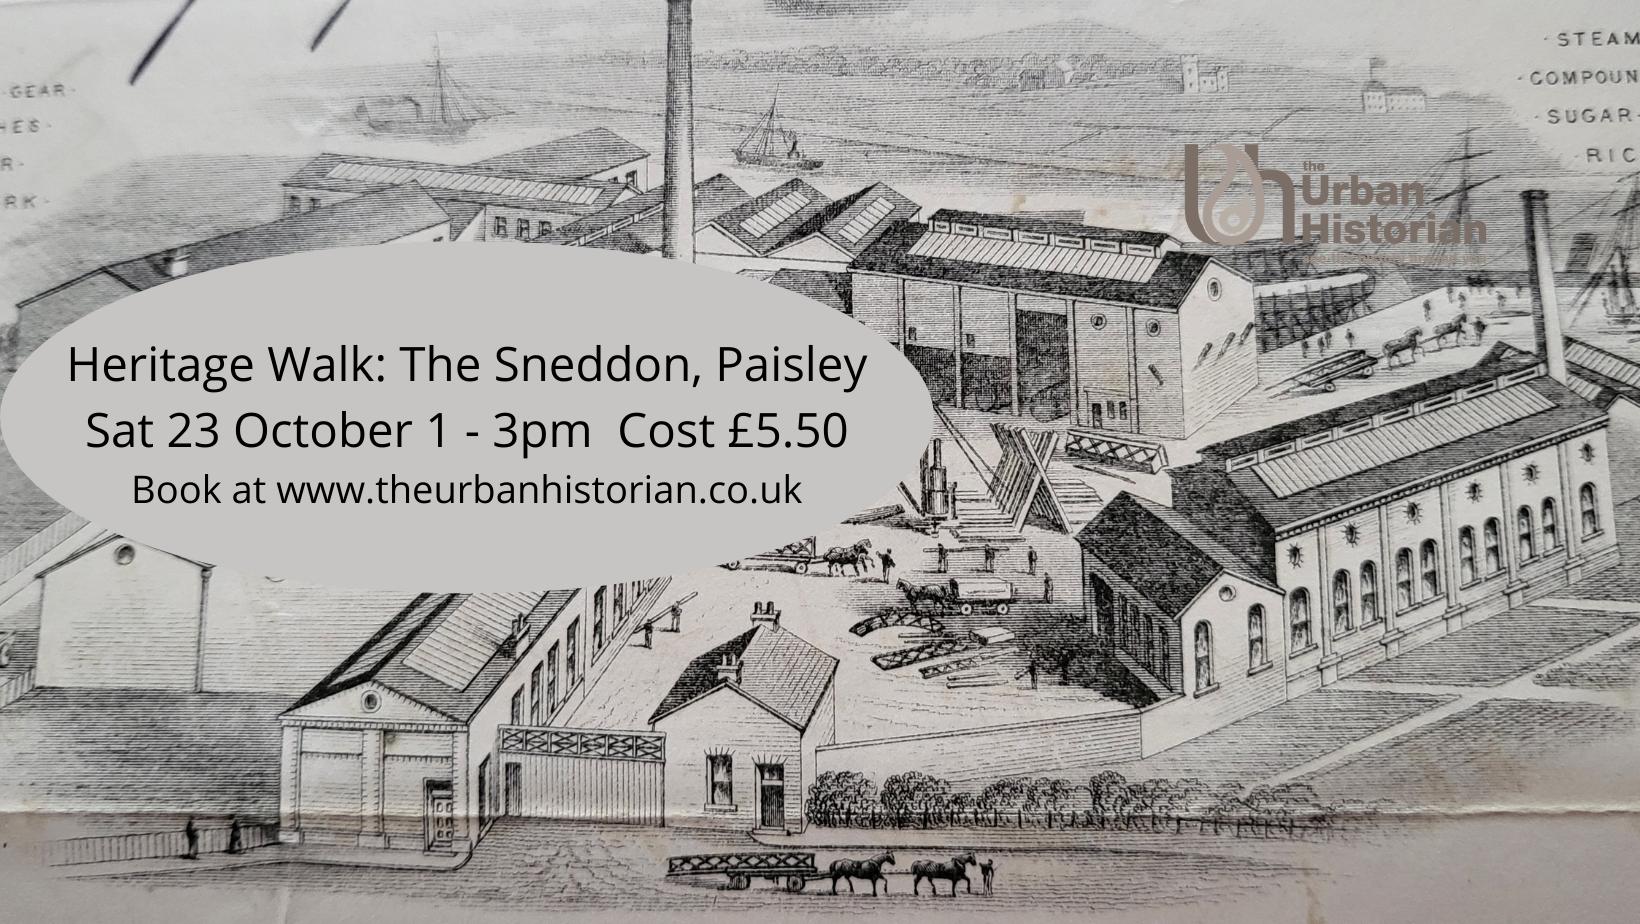 The Sneddon Heritage Walk - Sat 23 Oct 1 - 3pm